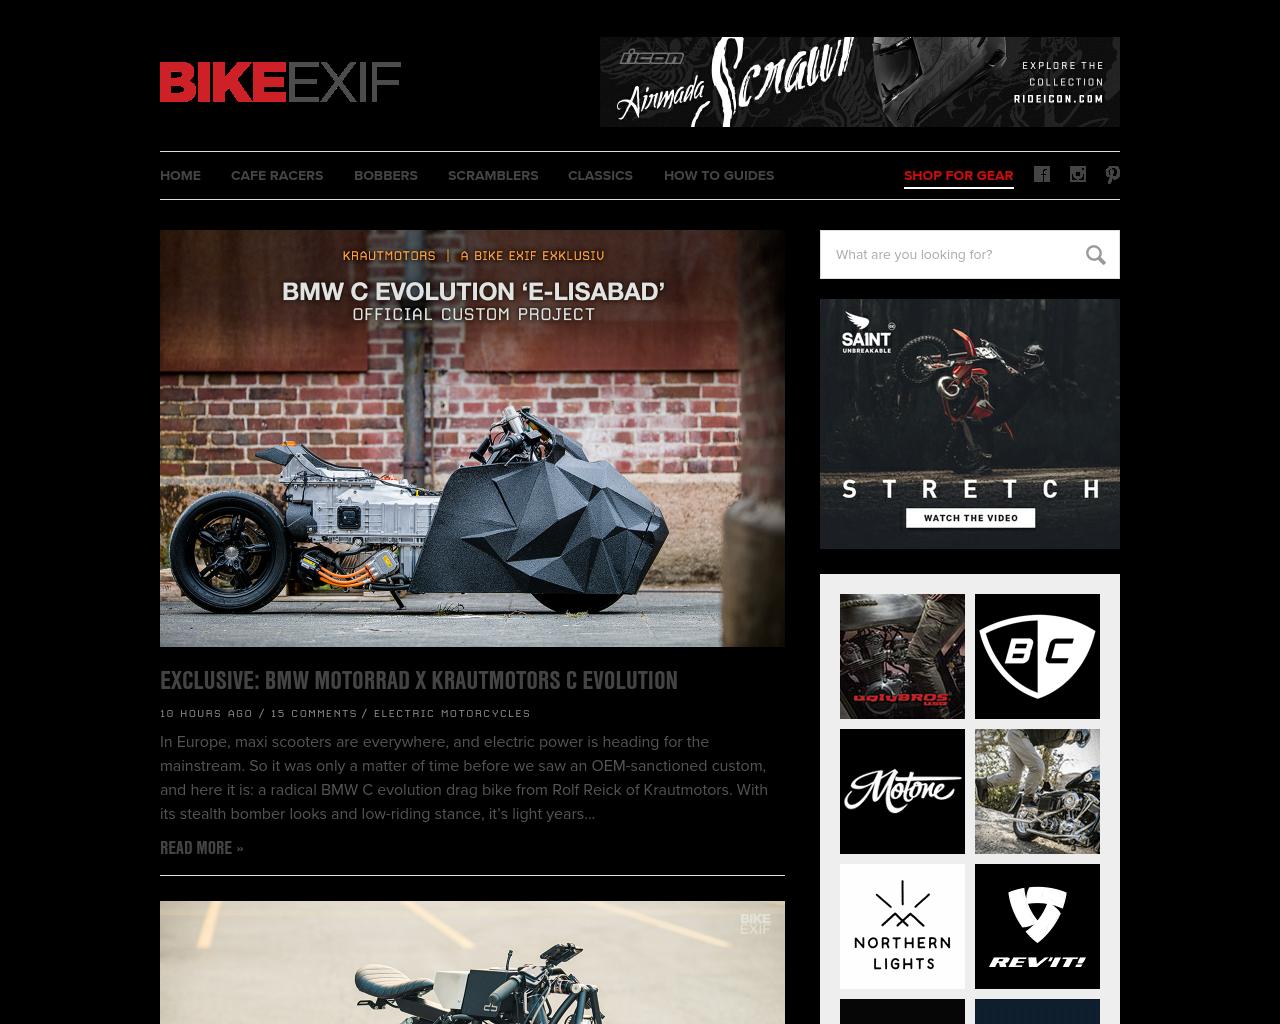 Bike-EXIF-Advertising-Reviews-Pricing